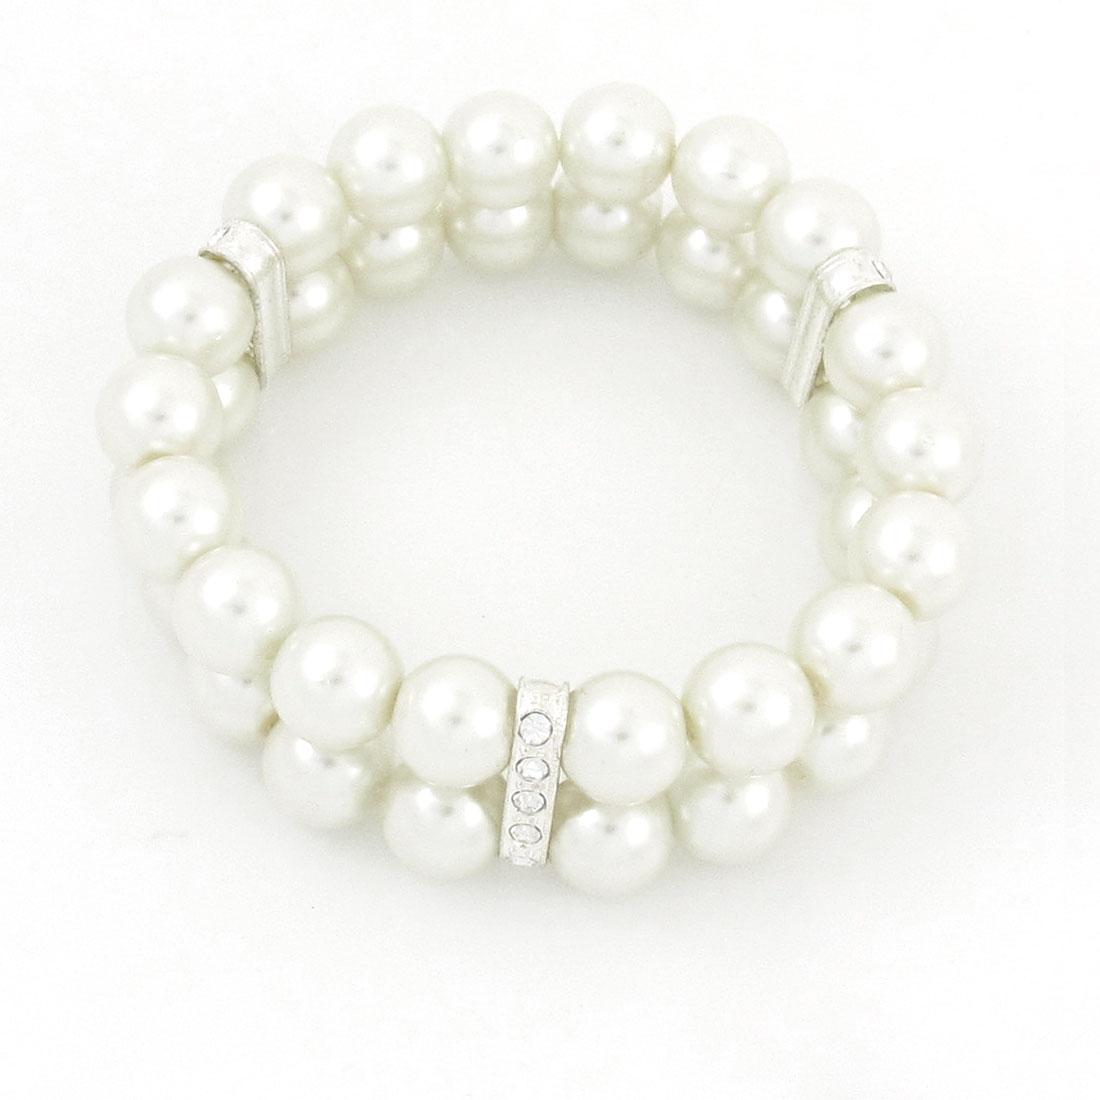 "0.4"" Dia White Double Row Imitation Pearls Bracelet Bangle Wrist Ornament"